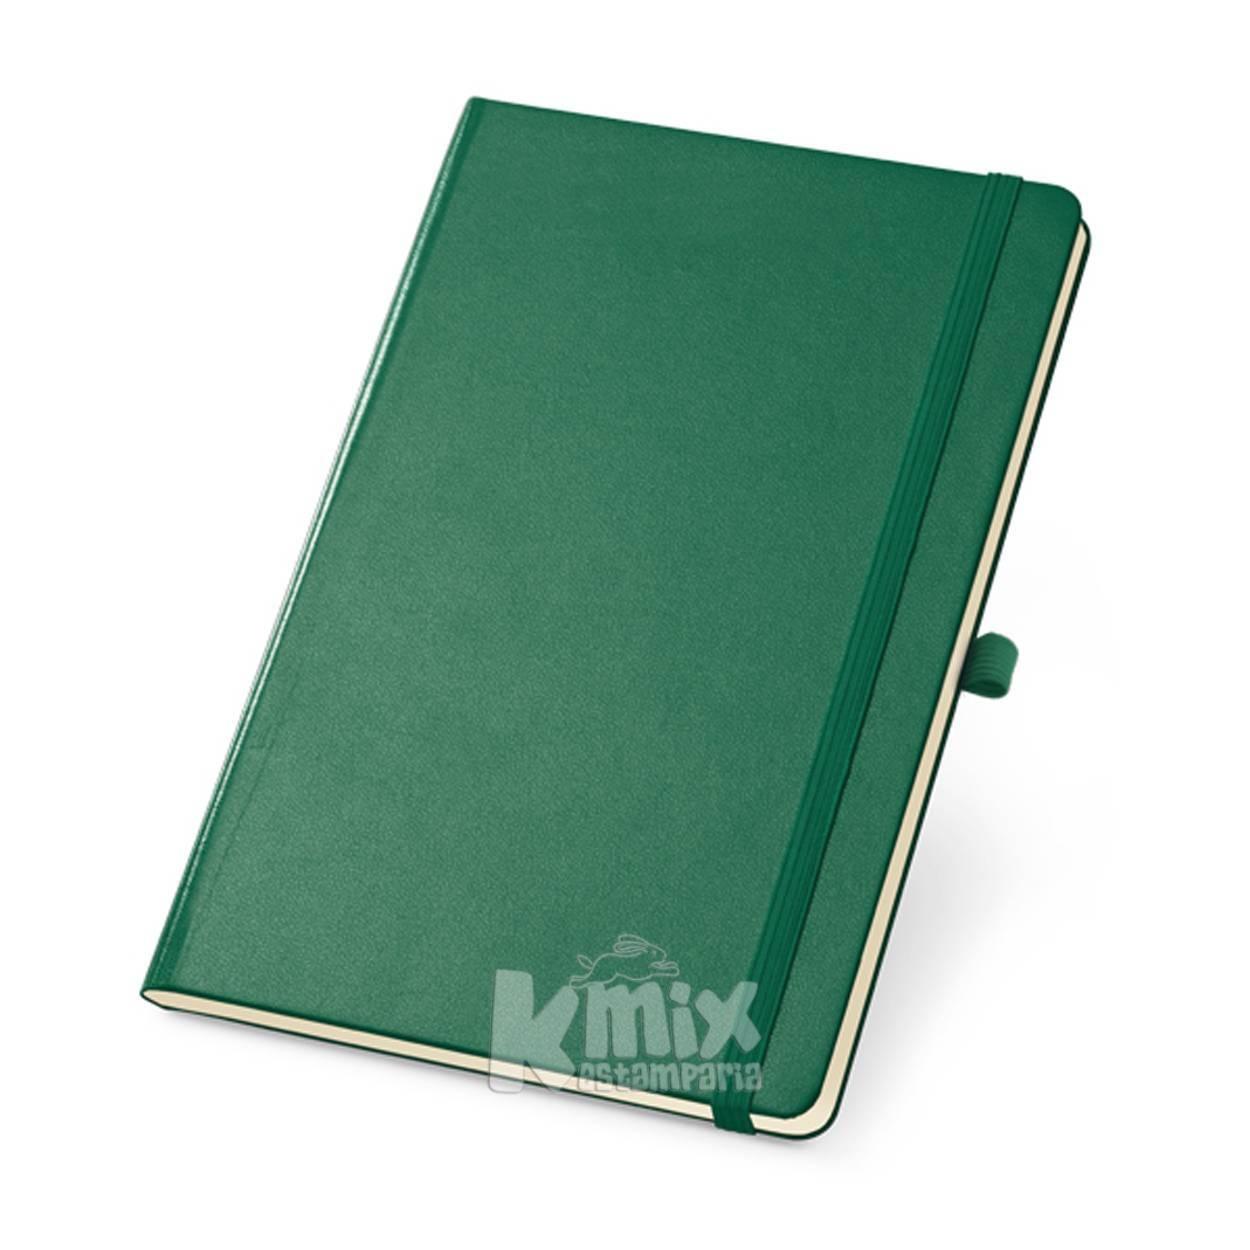 Caderno capa dura (93727) - kmix estamparia